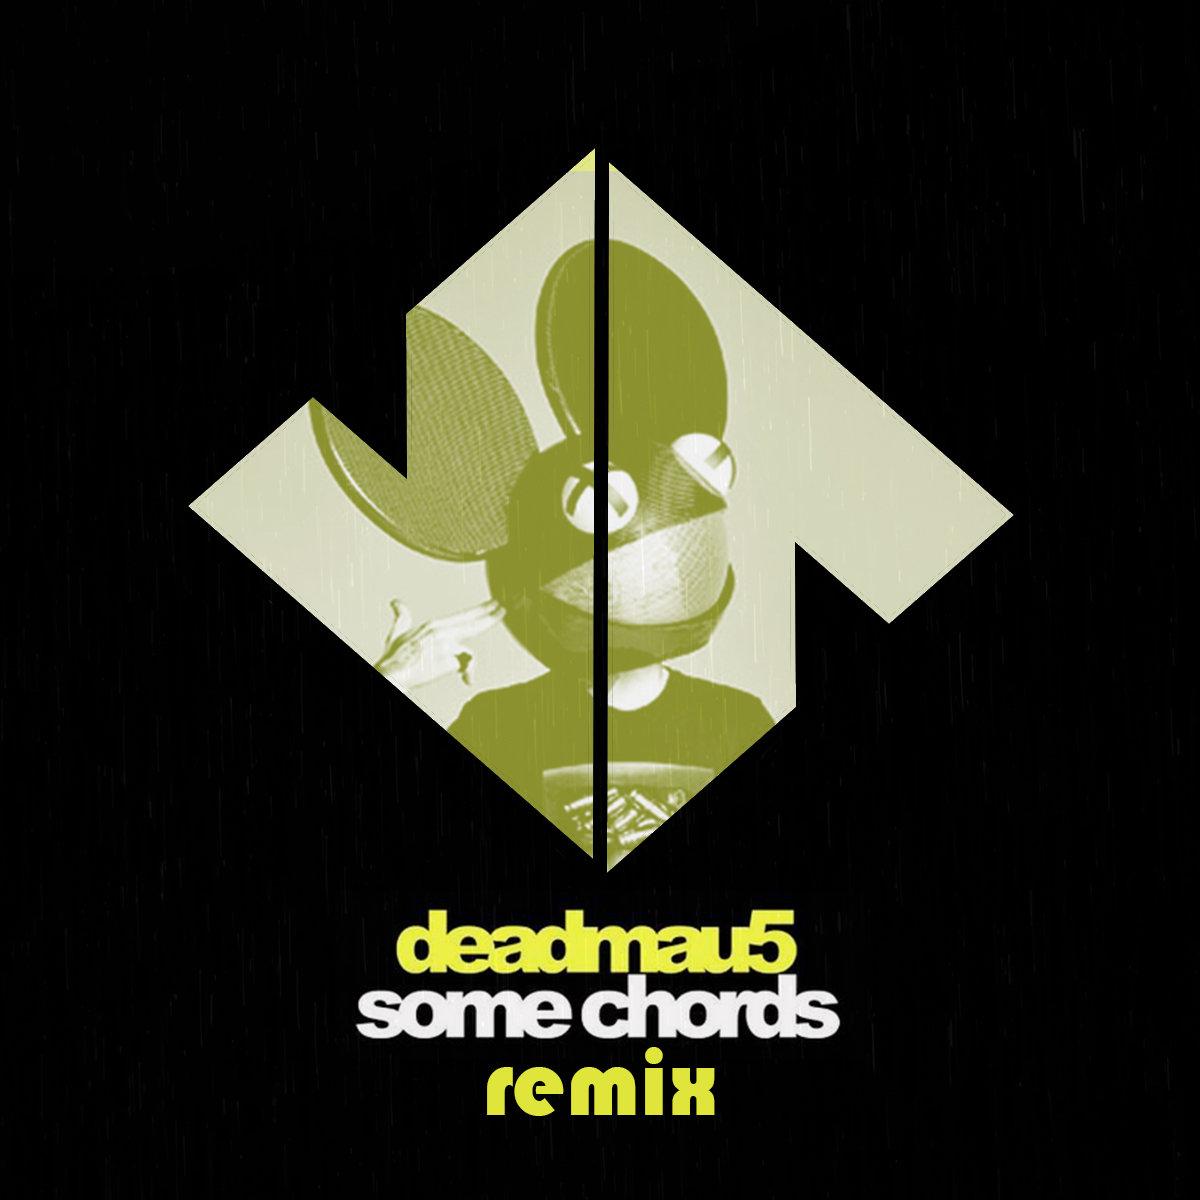 Deadmau5 some chords valzugg elect remix valzugg by valzugg hexwebz Images